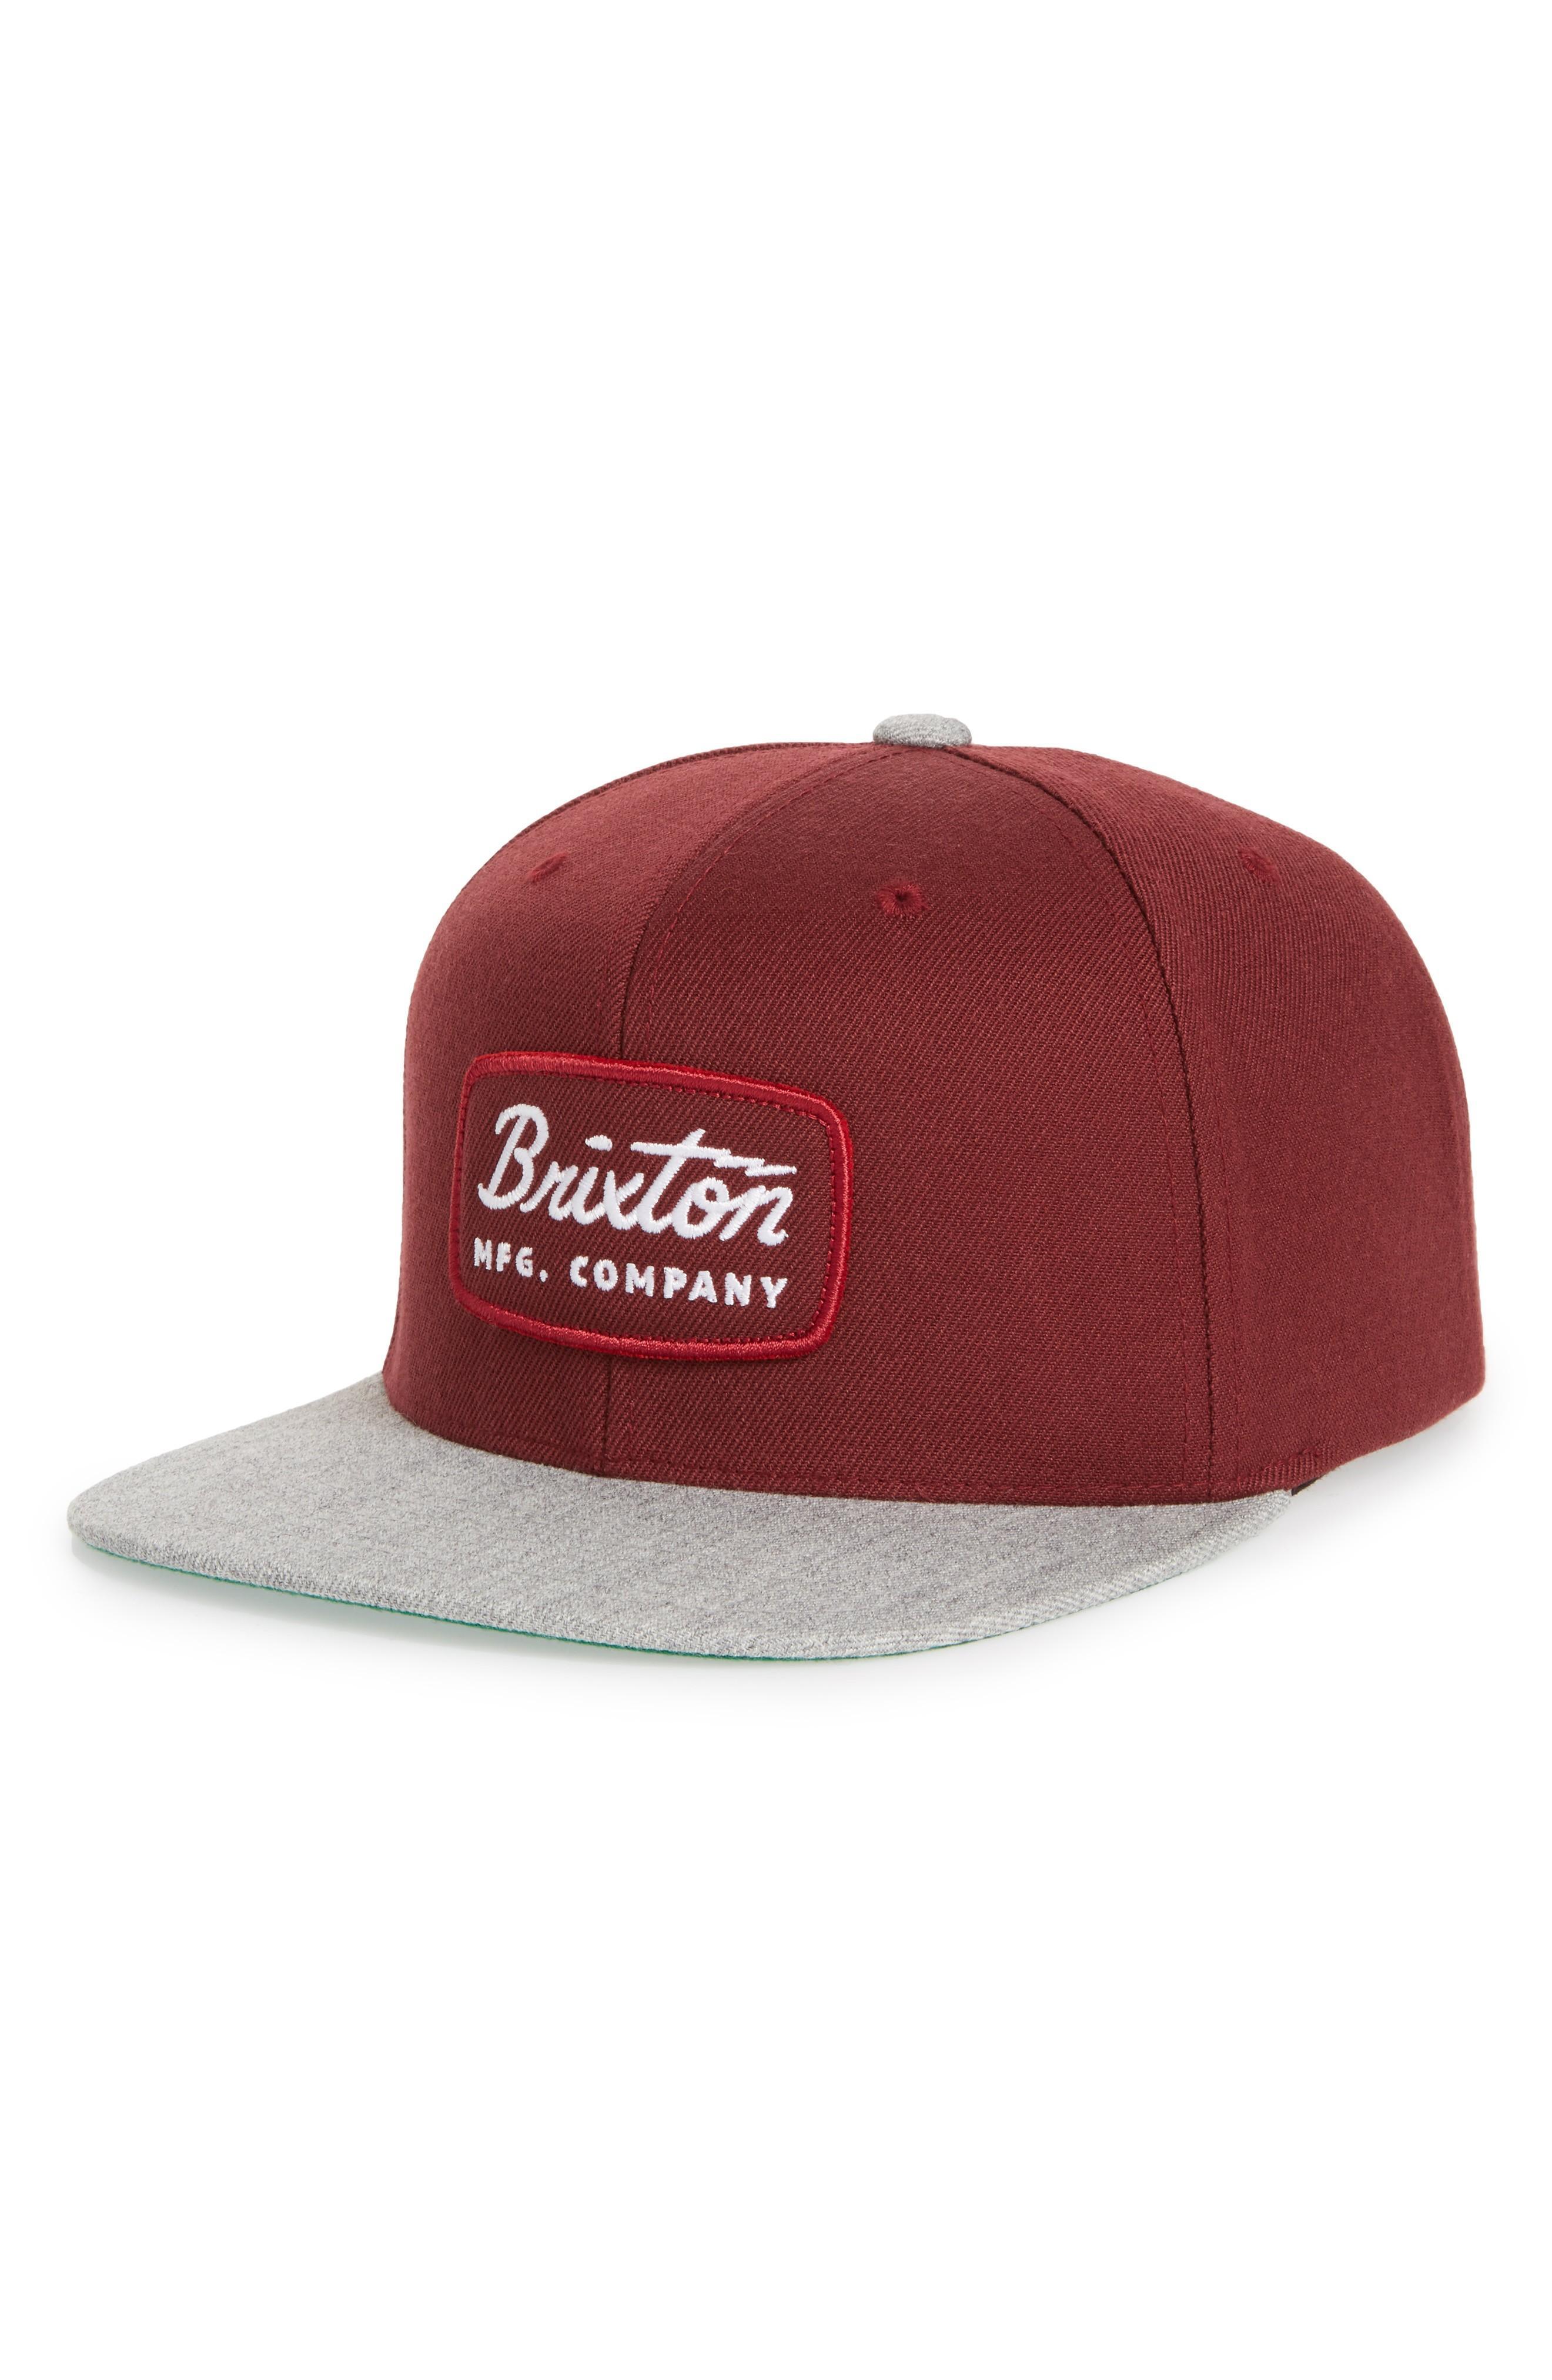 3aeb56db64c011 Brixton 'Jolt' Snapback Cap - Grey In Heather Grey/ Maroon   ModeSens